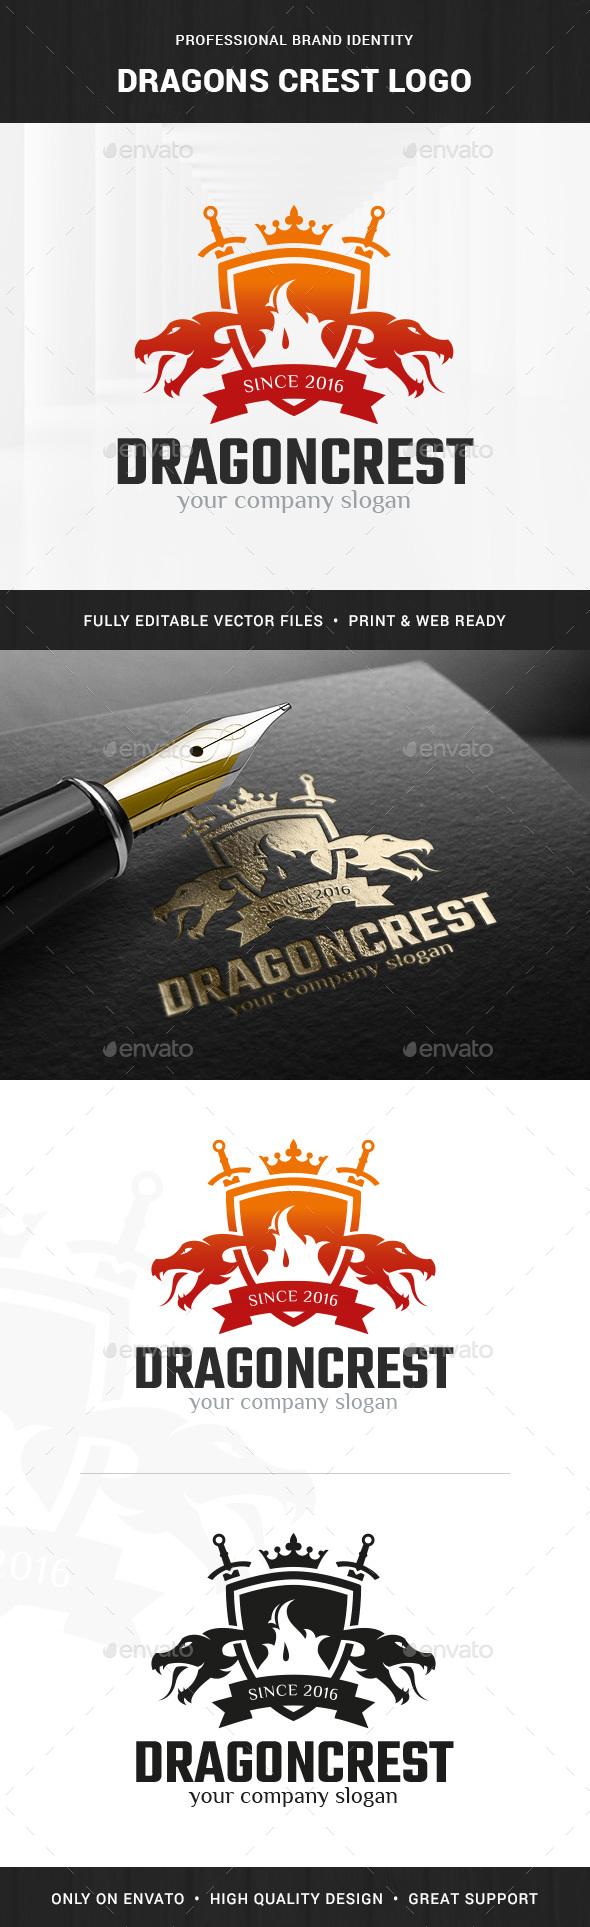 Dragons Crest Logo Template